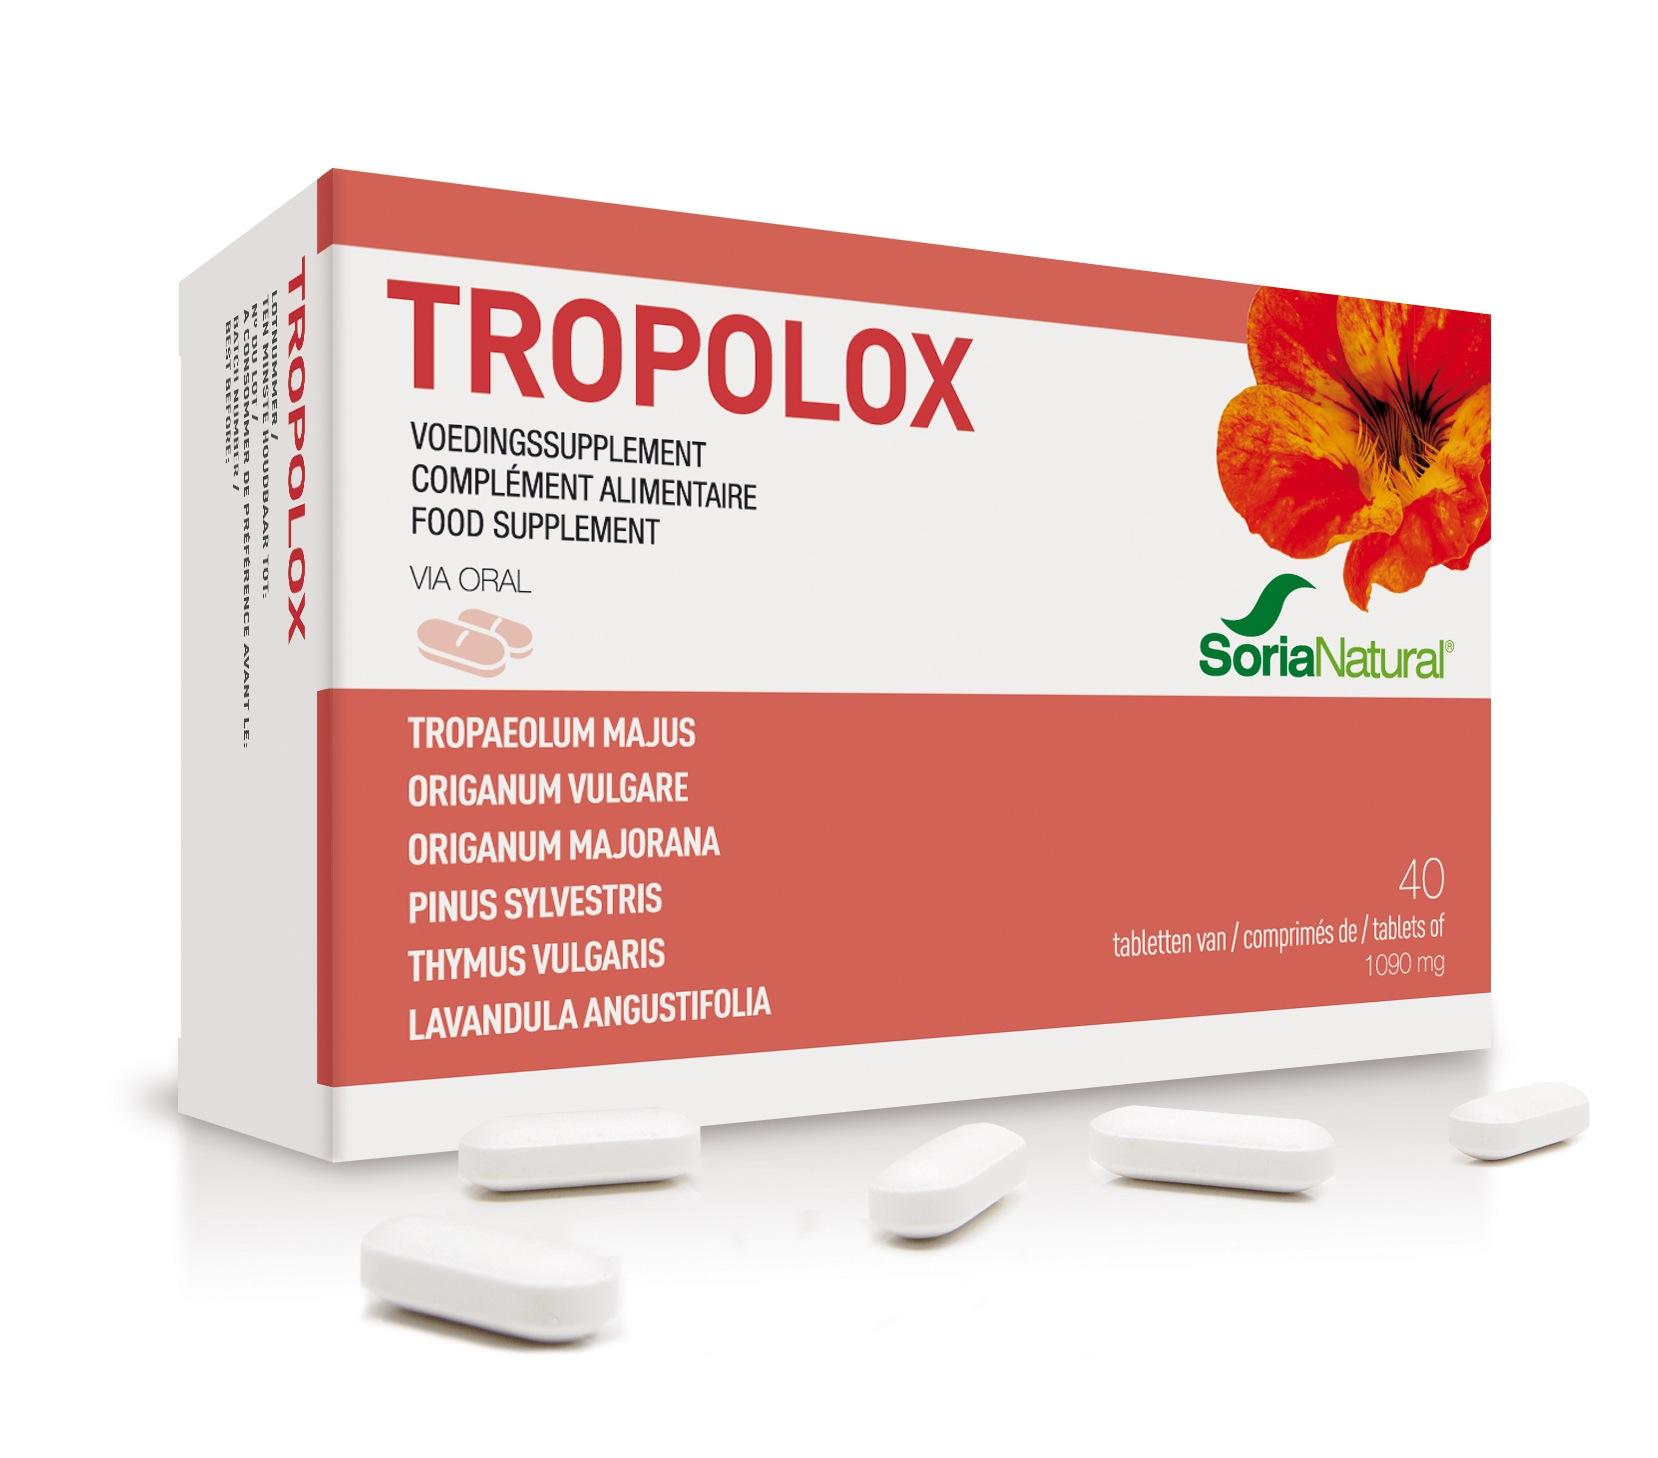 Tropolox